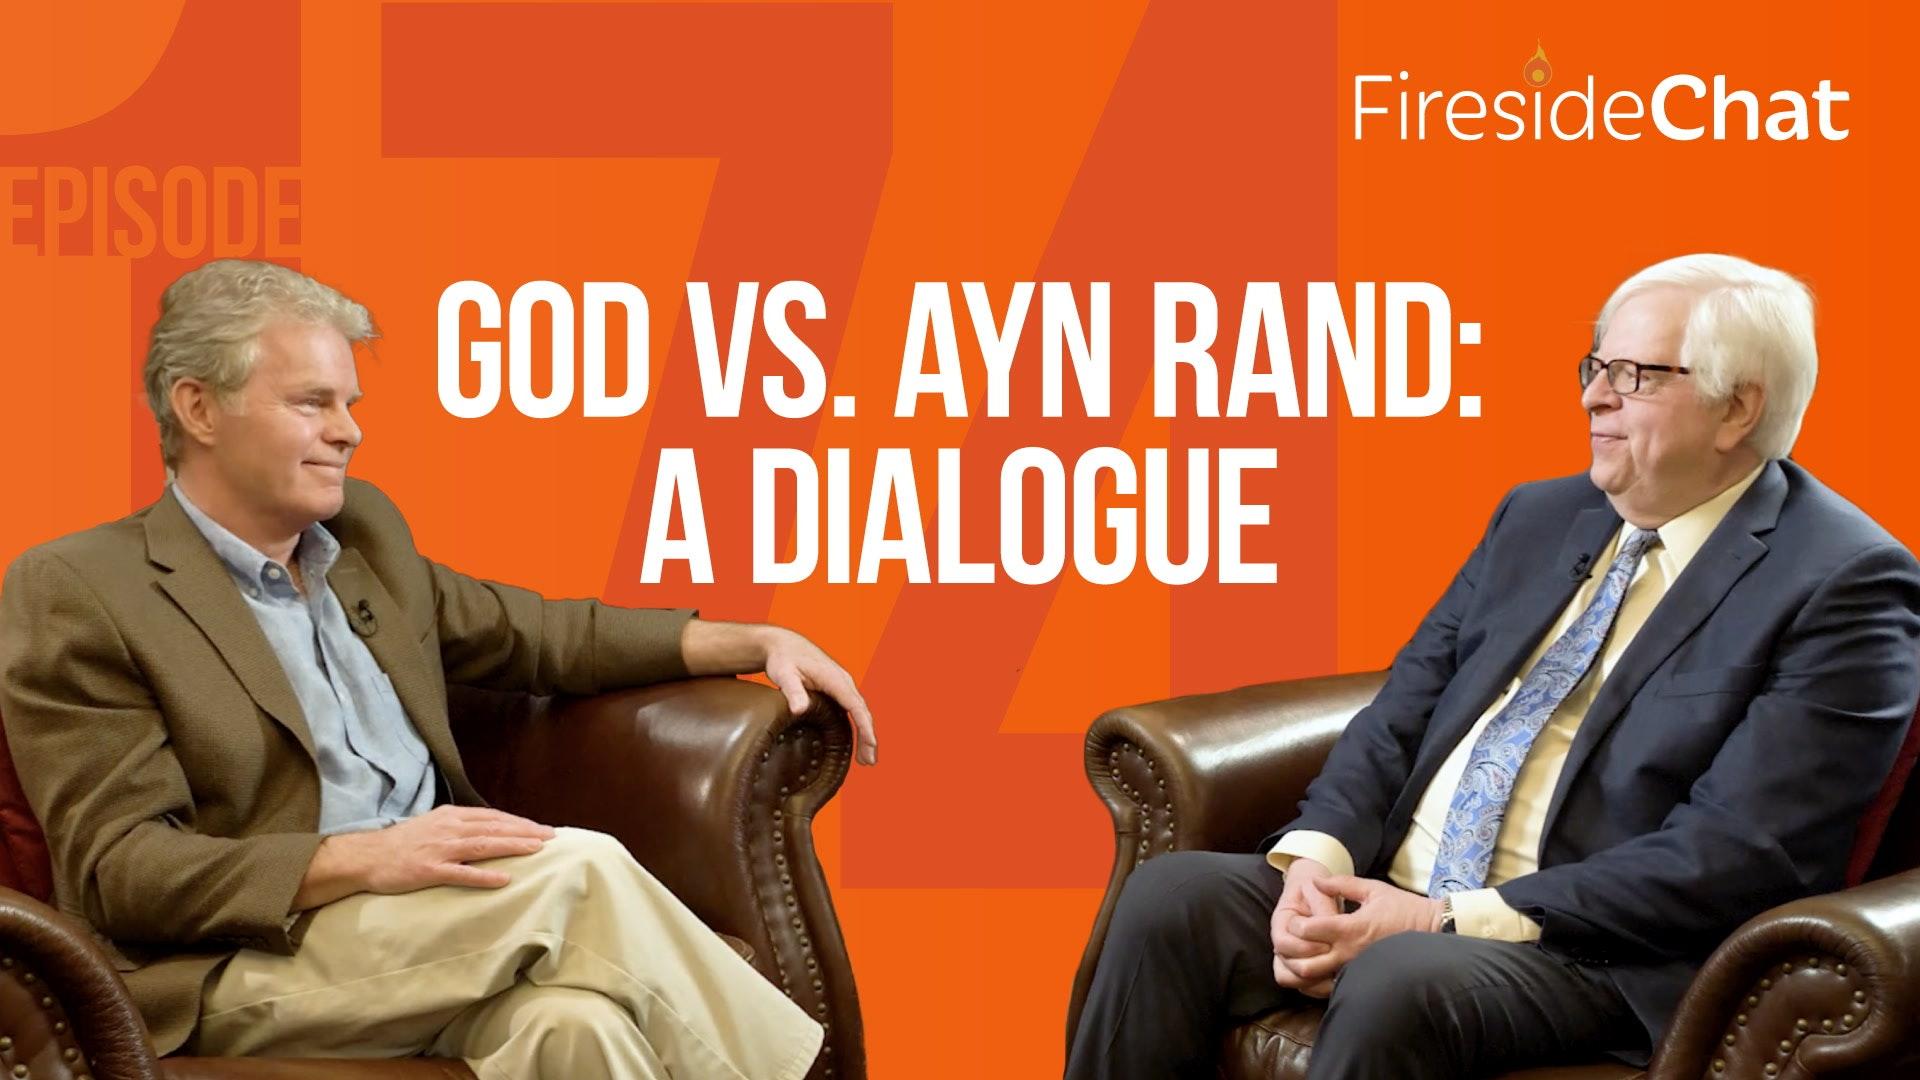 Ep. 174 — God vs. Ayn Rand: A Dialogue